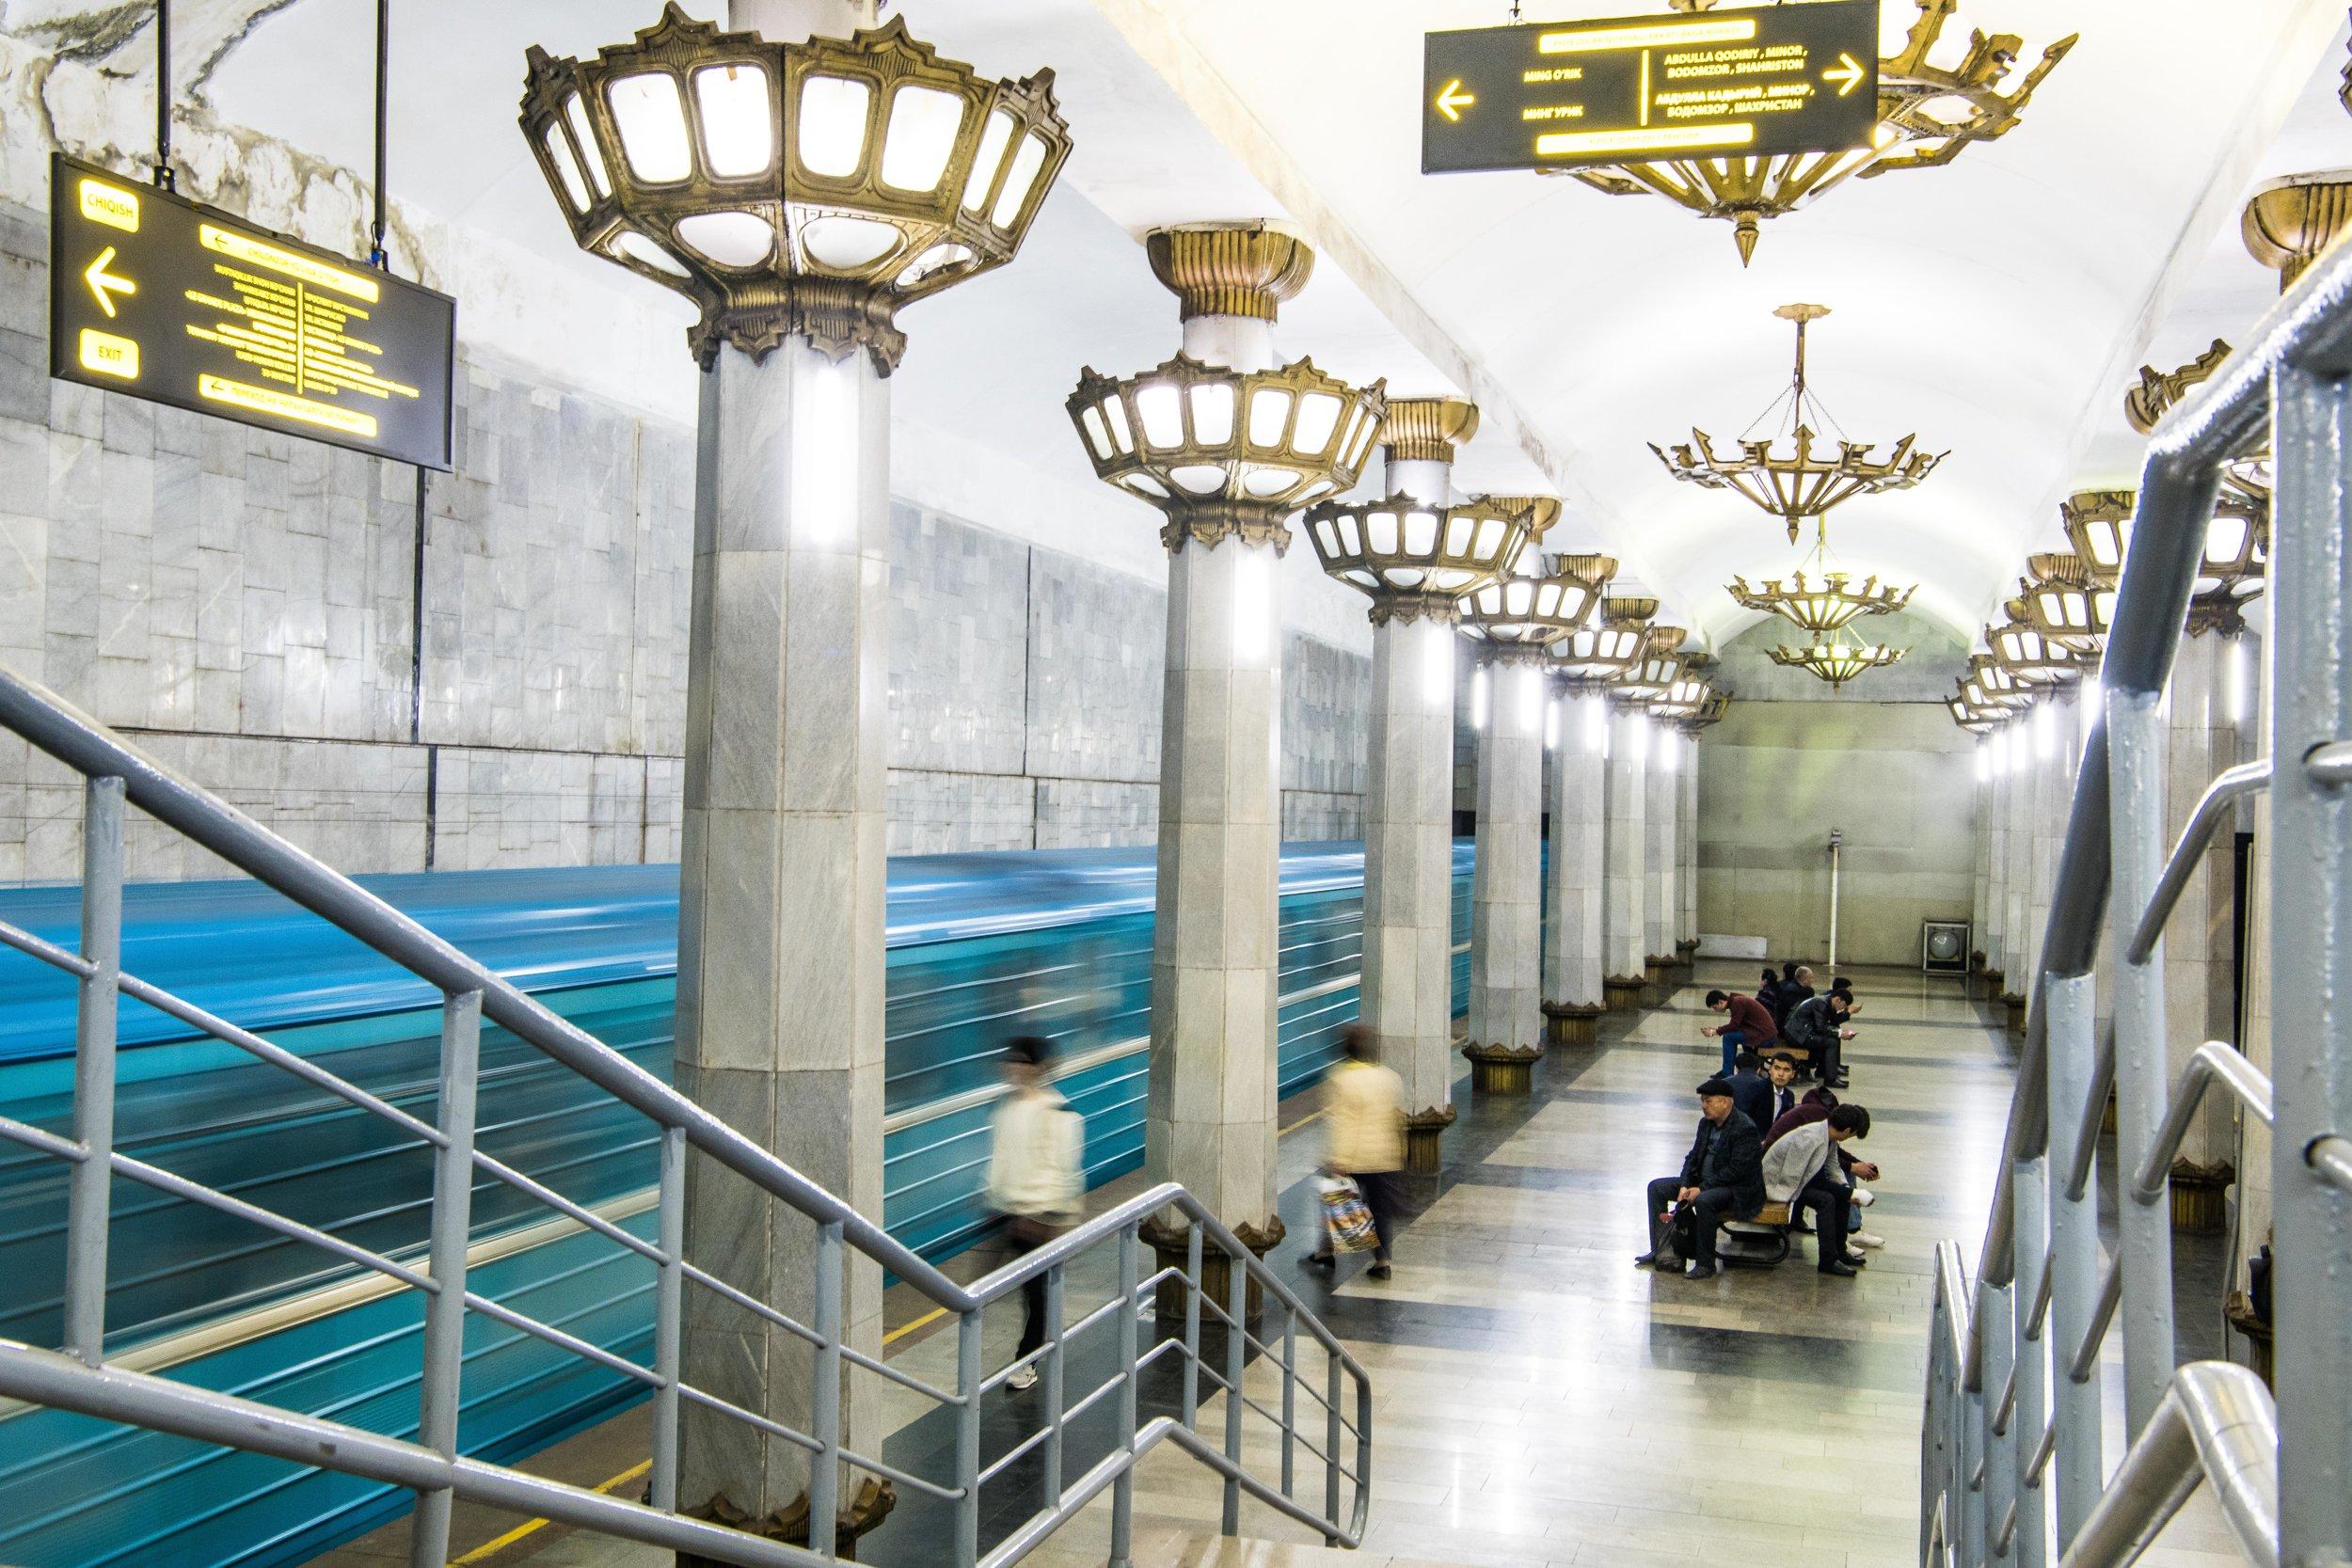 Tashkent-8944.jpg